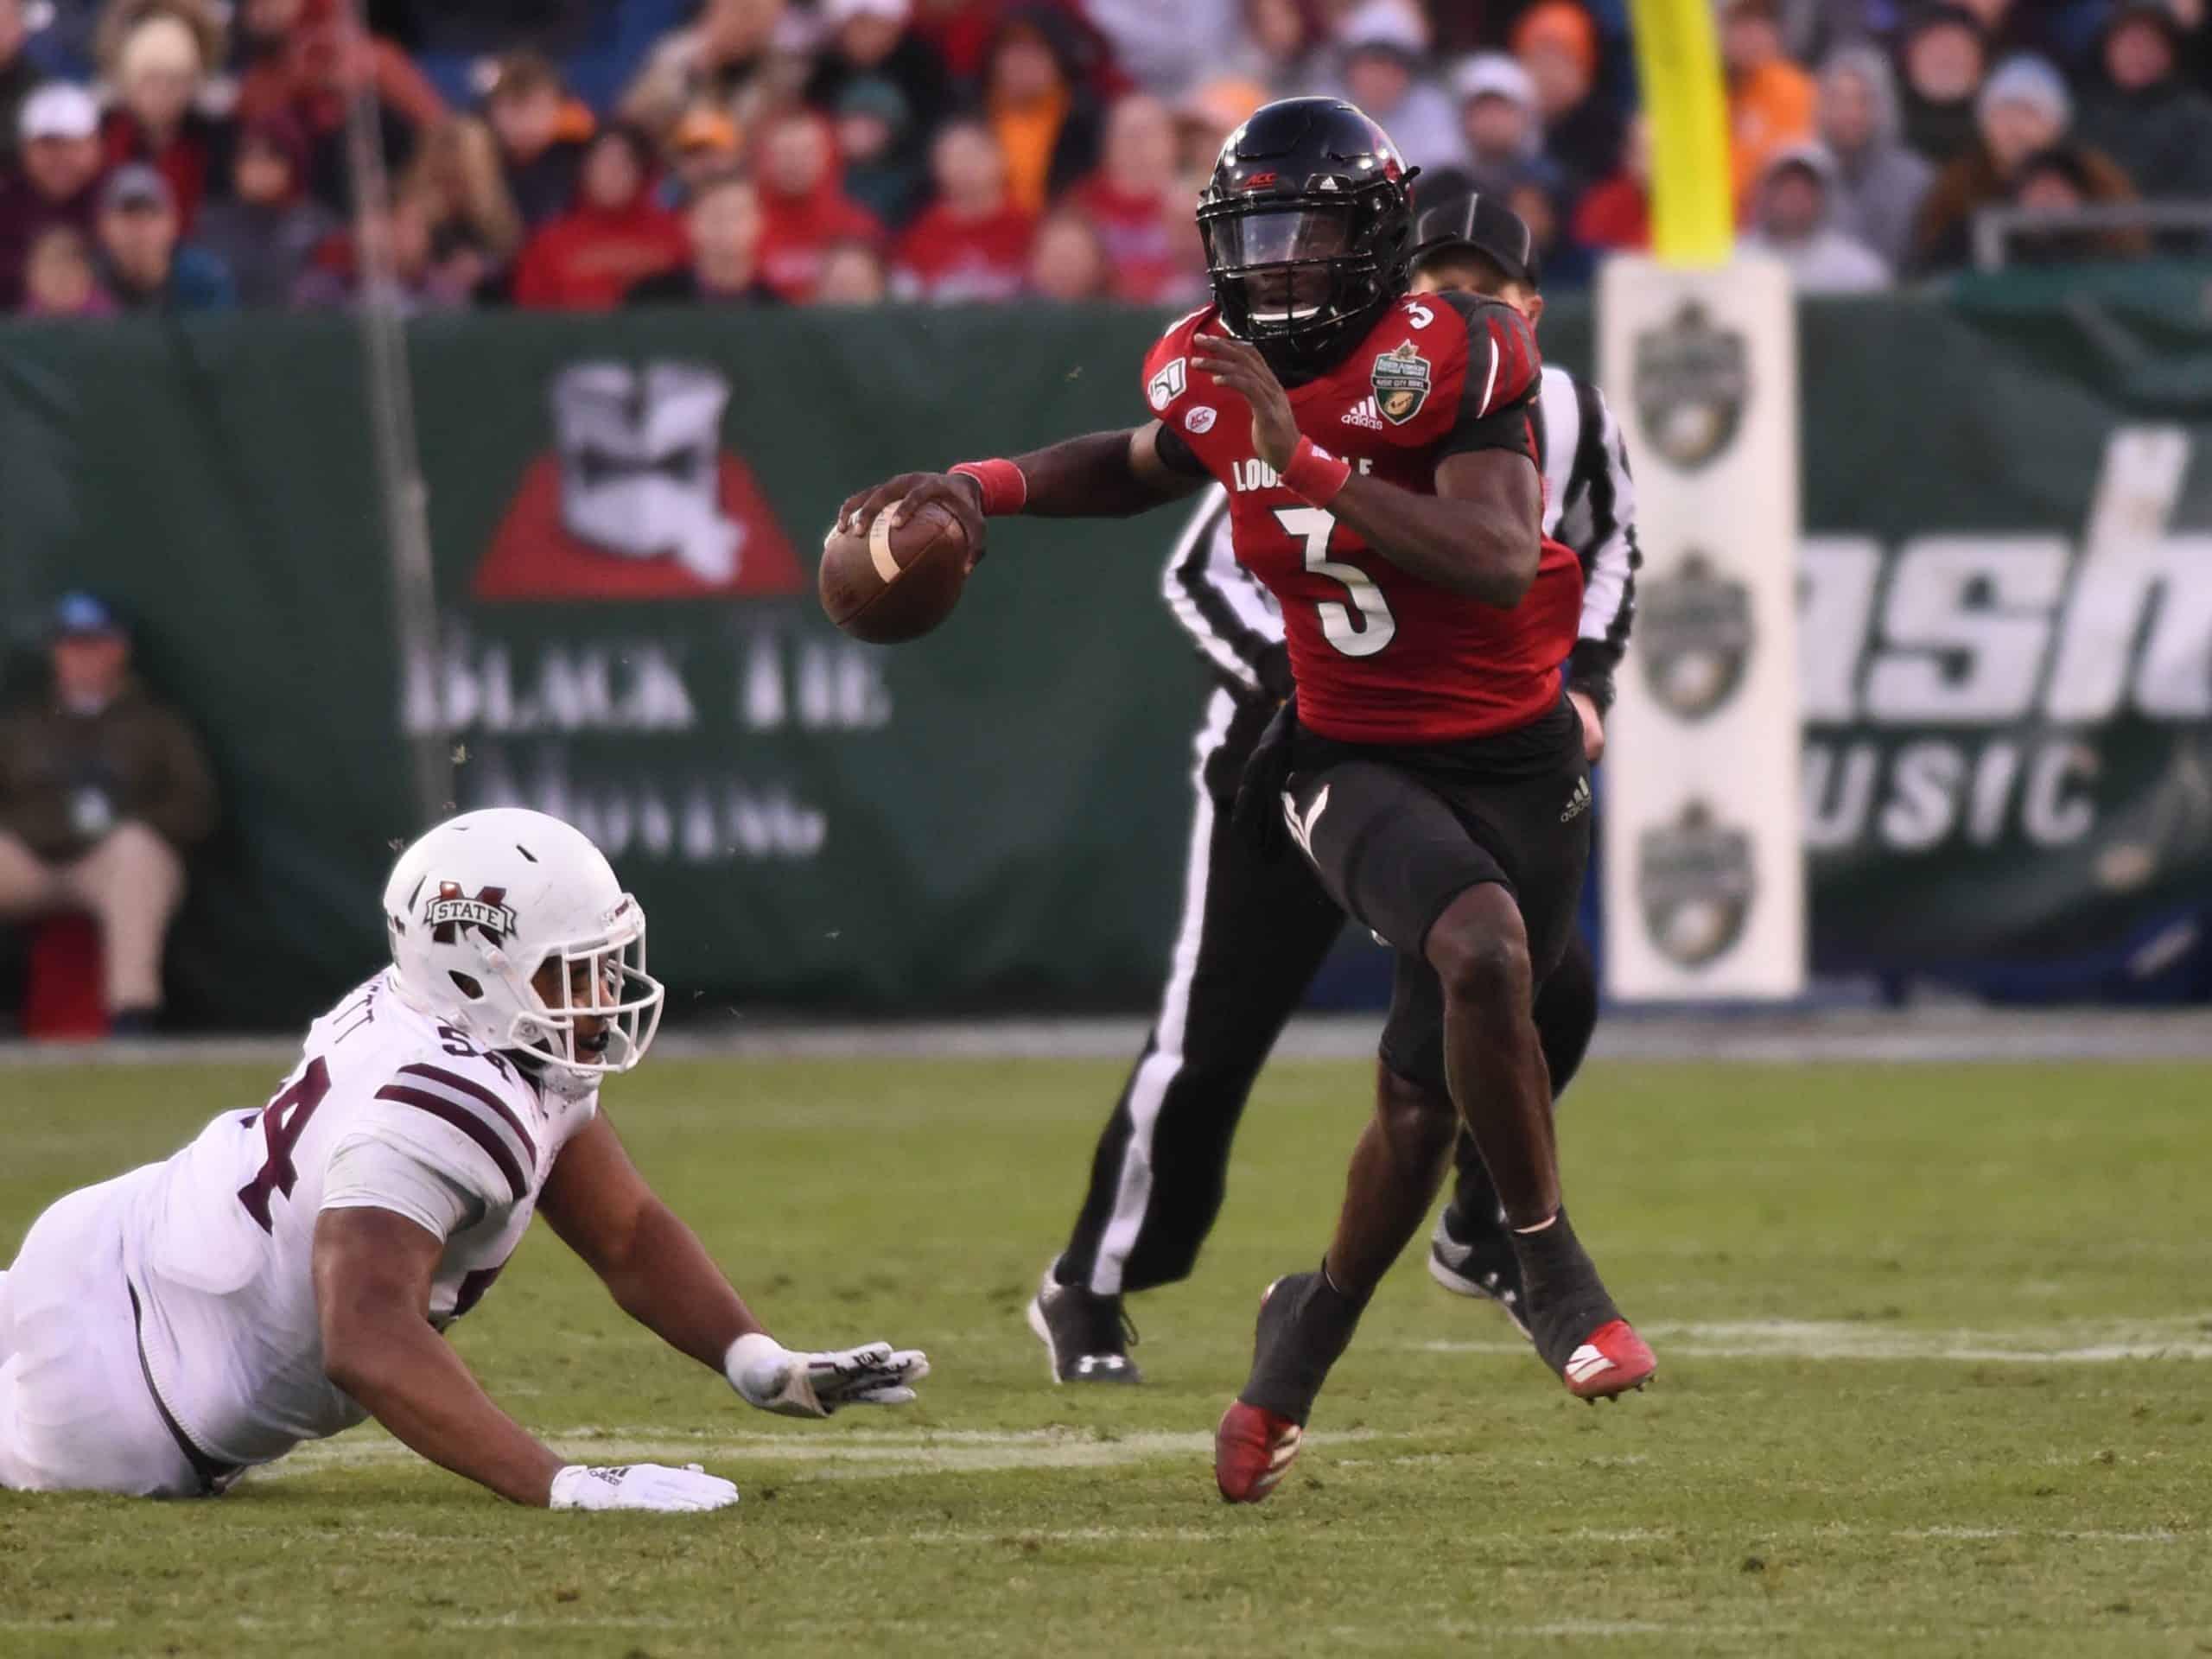 Louisville Quarterback Micale Cunningham has riser potential